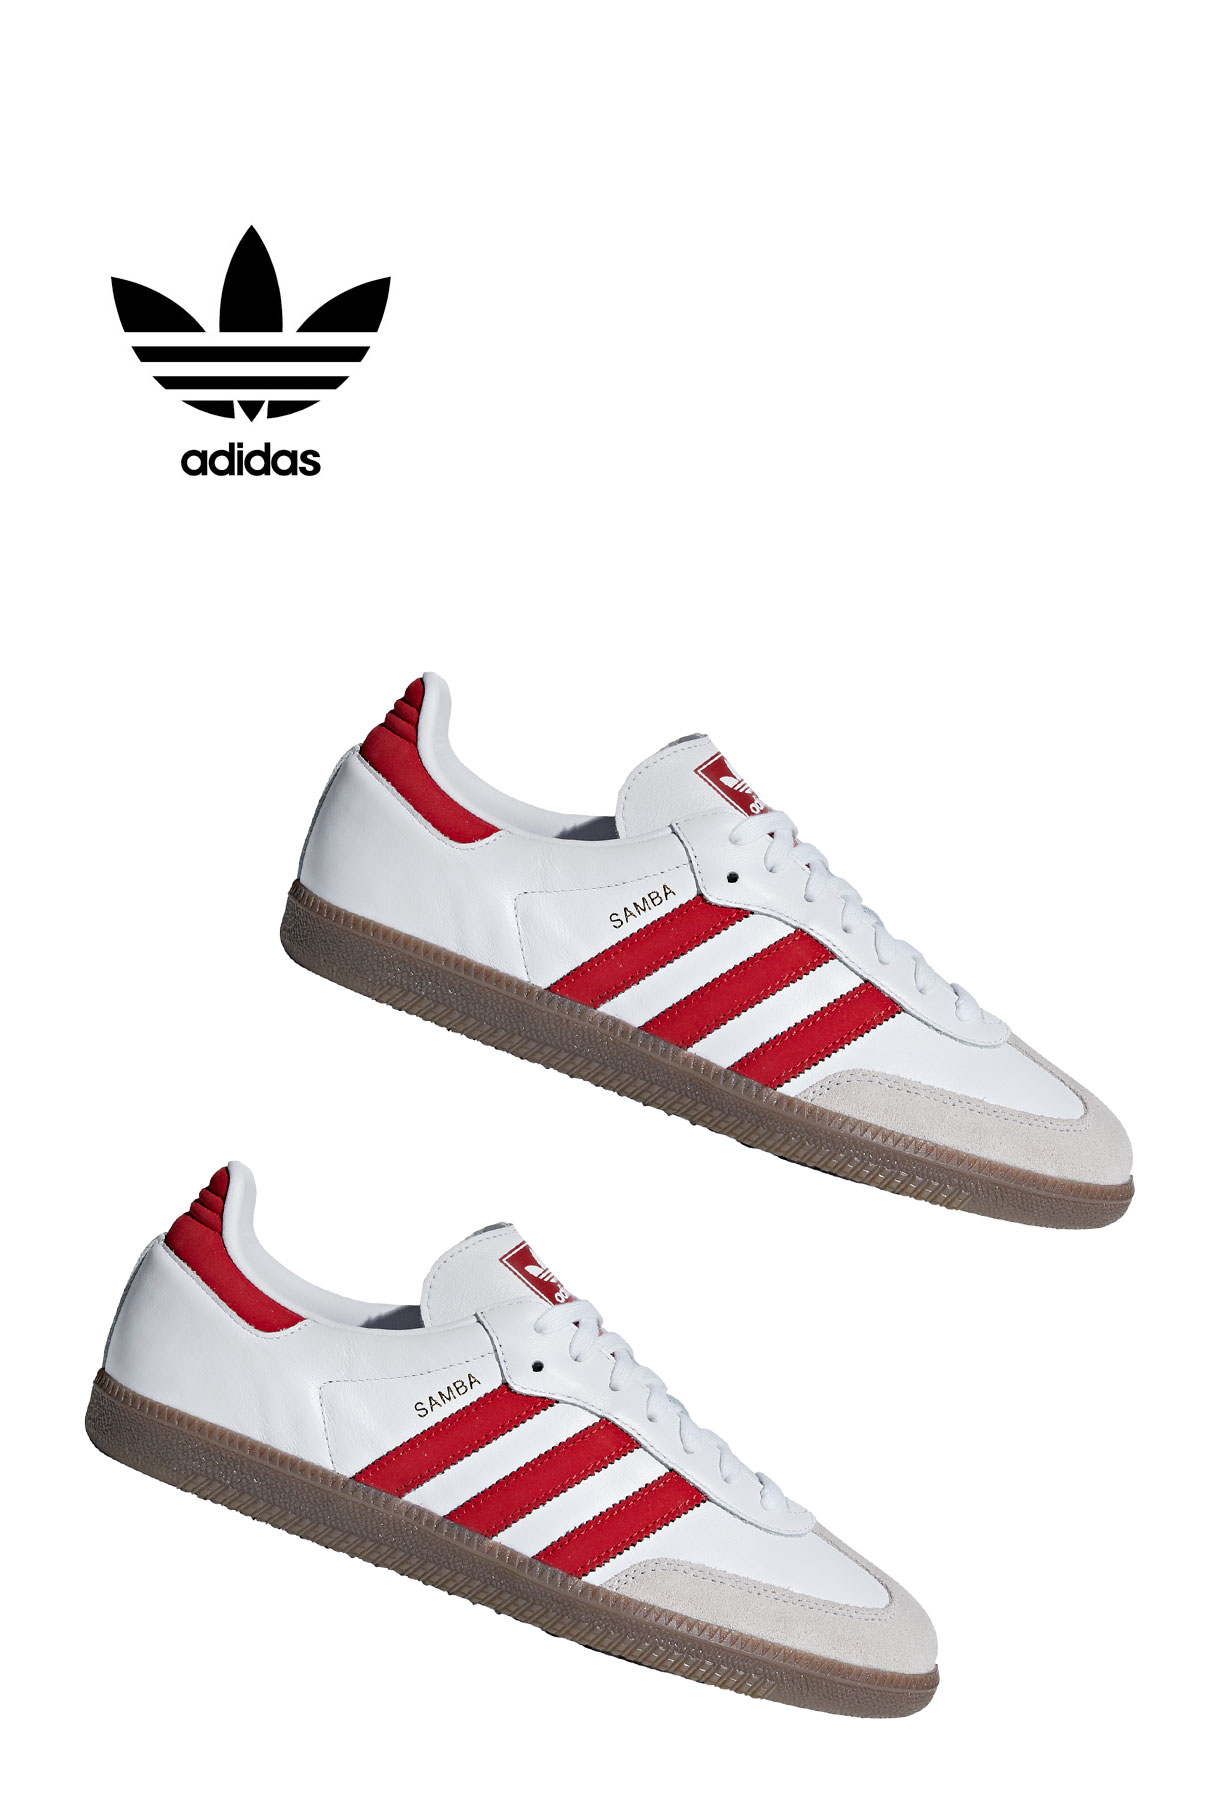 adidas samba 28